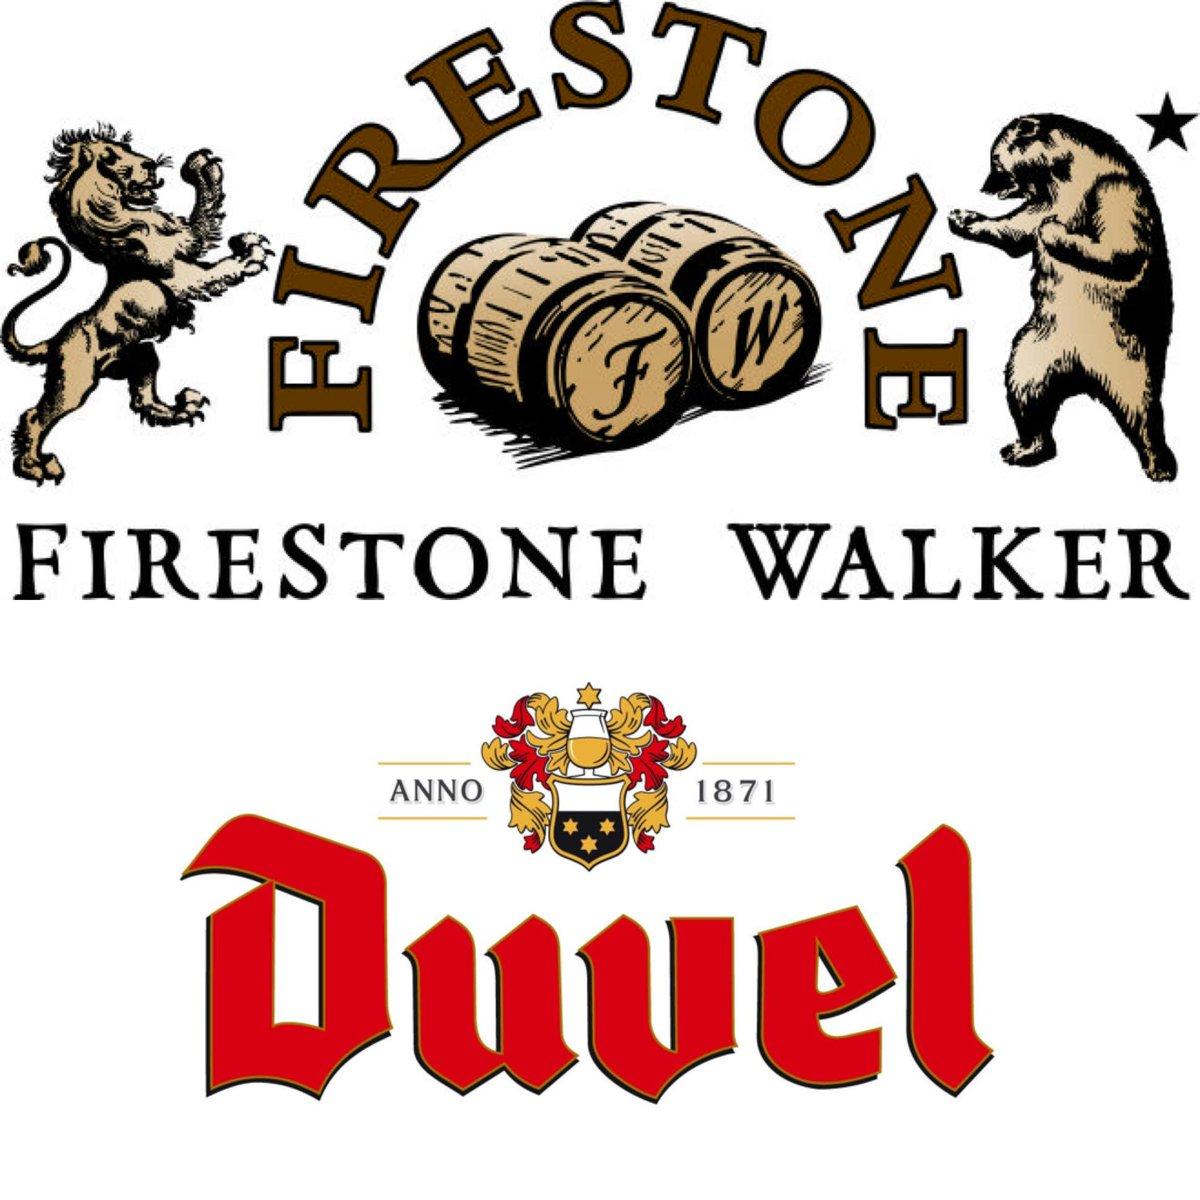 Breaking #CraftBeer News - @FirestoneWalker Brewing Has Been Acquired by @DuvelBeer Moortgat http://t.co/9ebyADJ5bv http://t.co/ZskSsF1bST